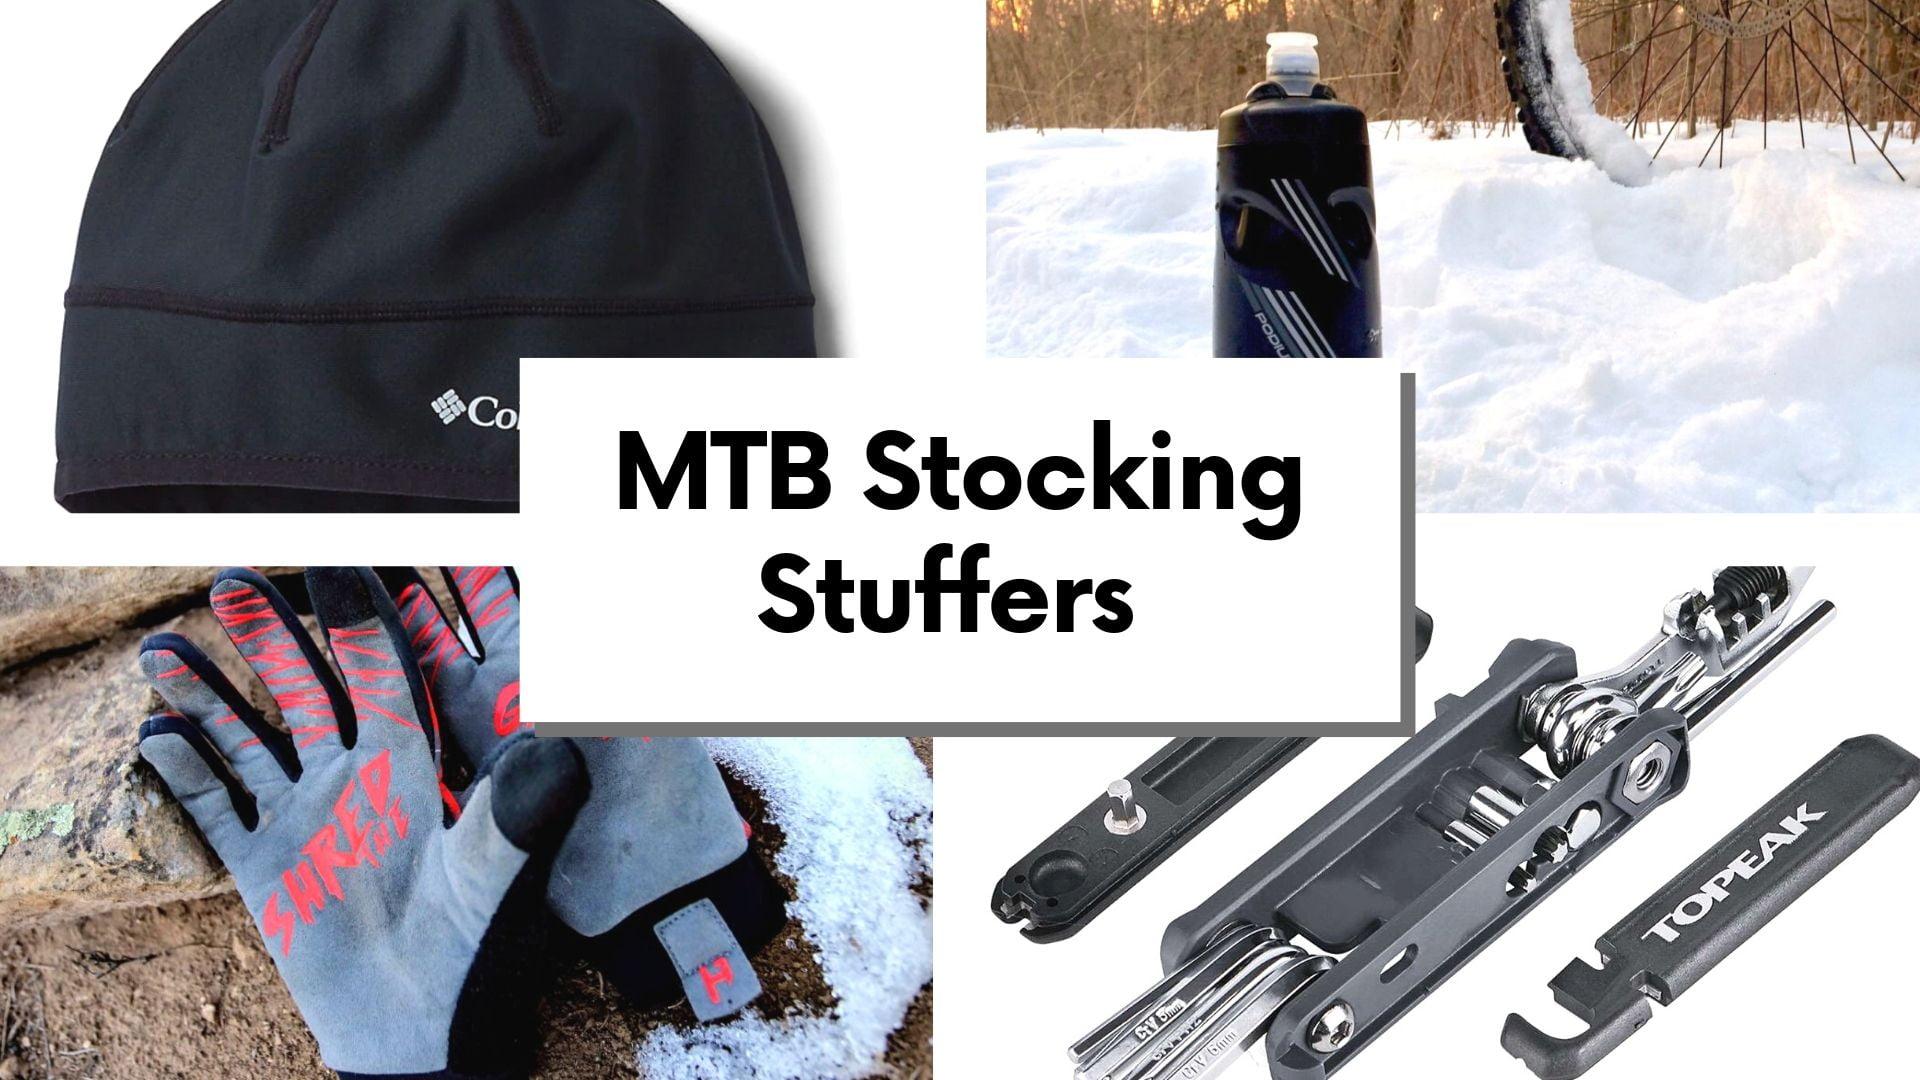 5 Mountain Bike Stocking Stuffers